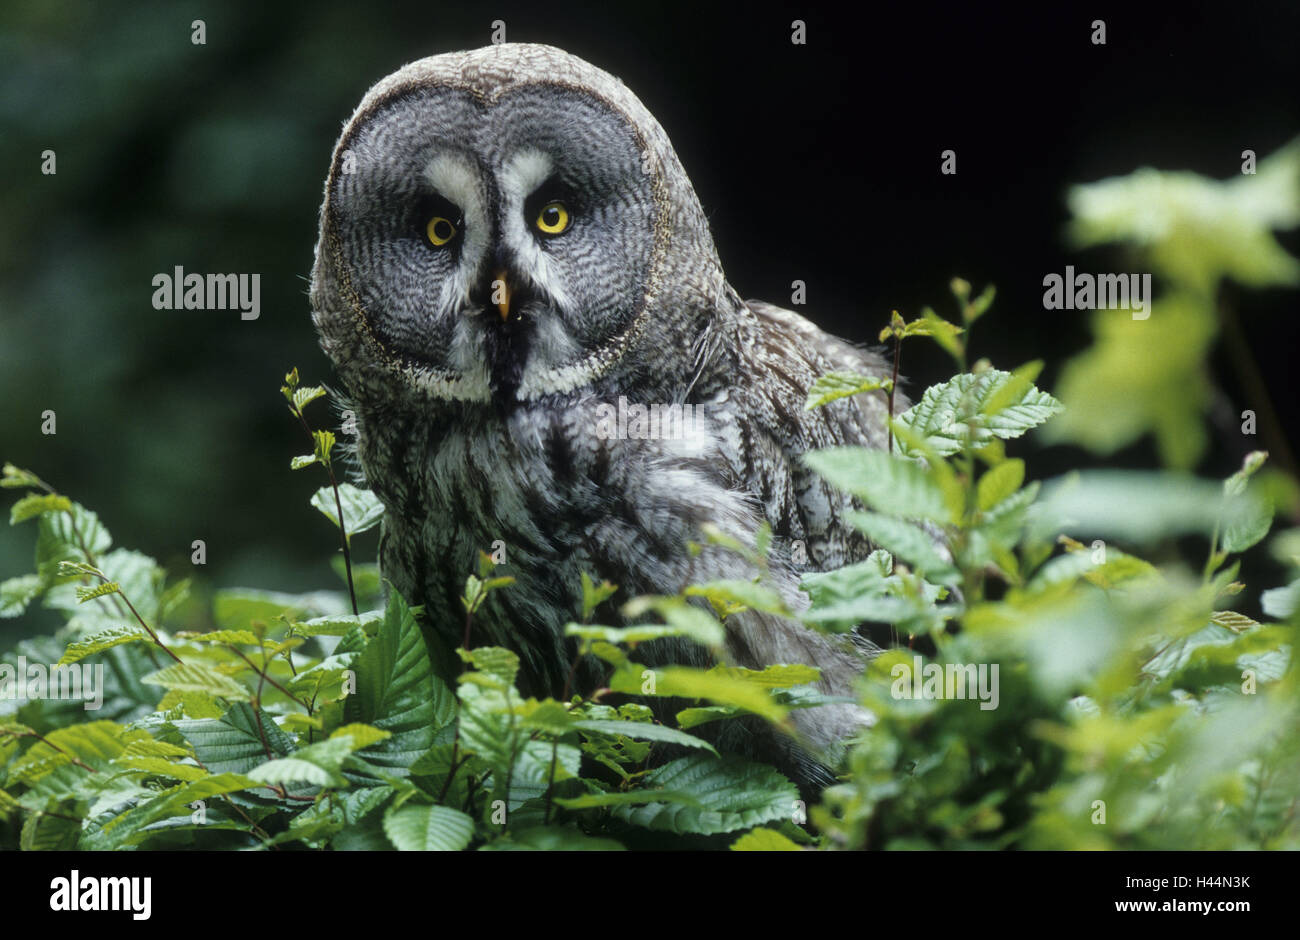 Beard owl, Strix nebulosa, portrait, - Stock Image